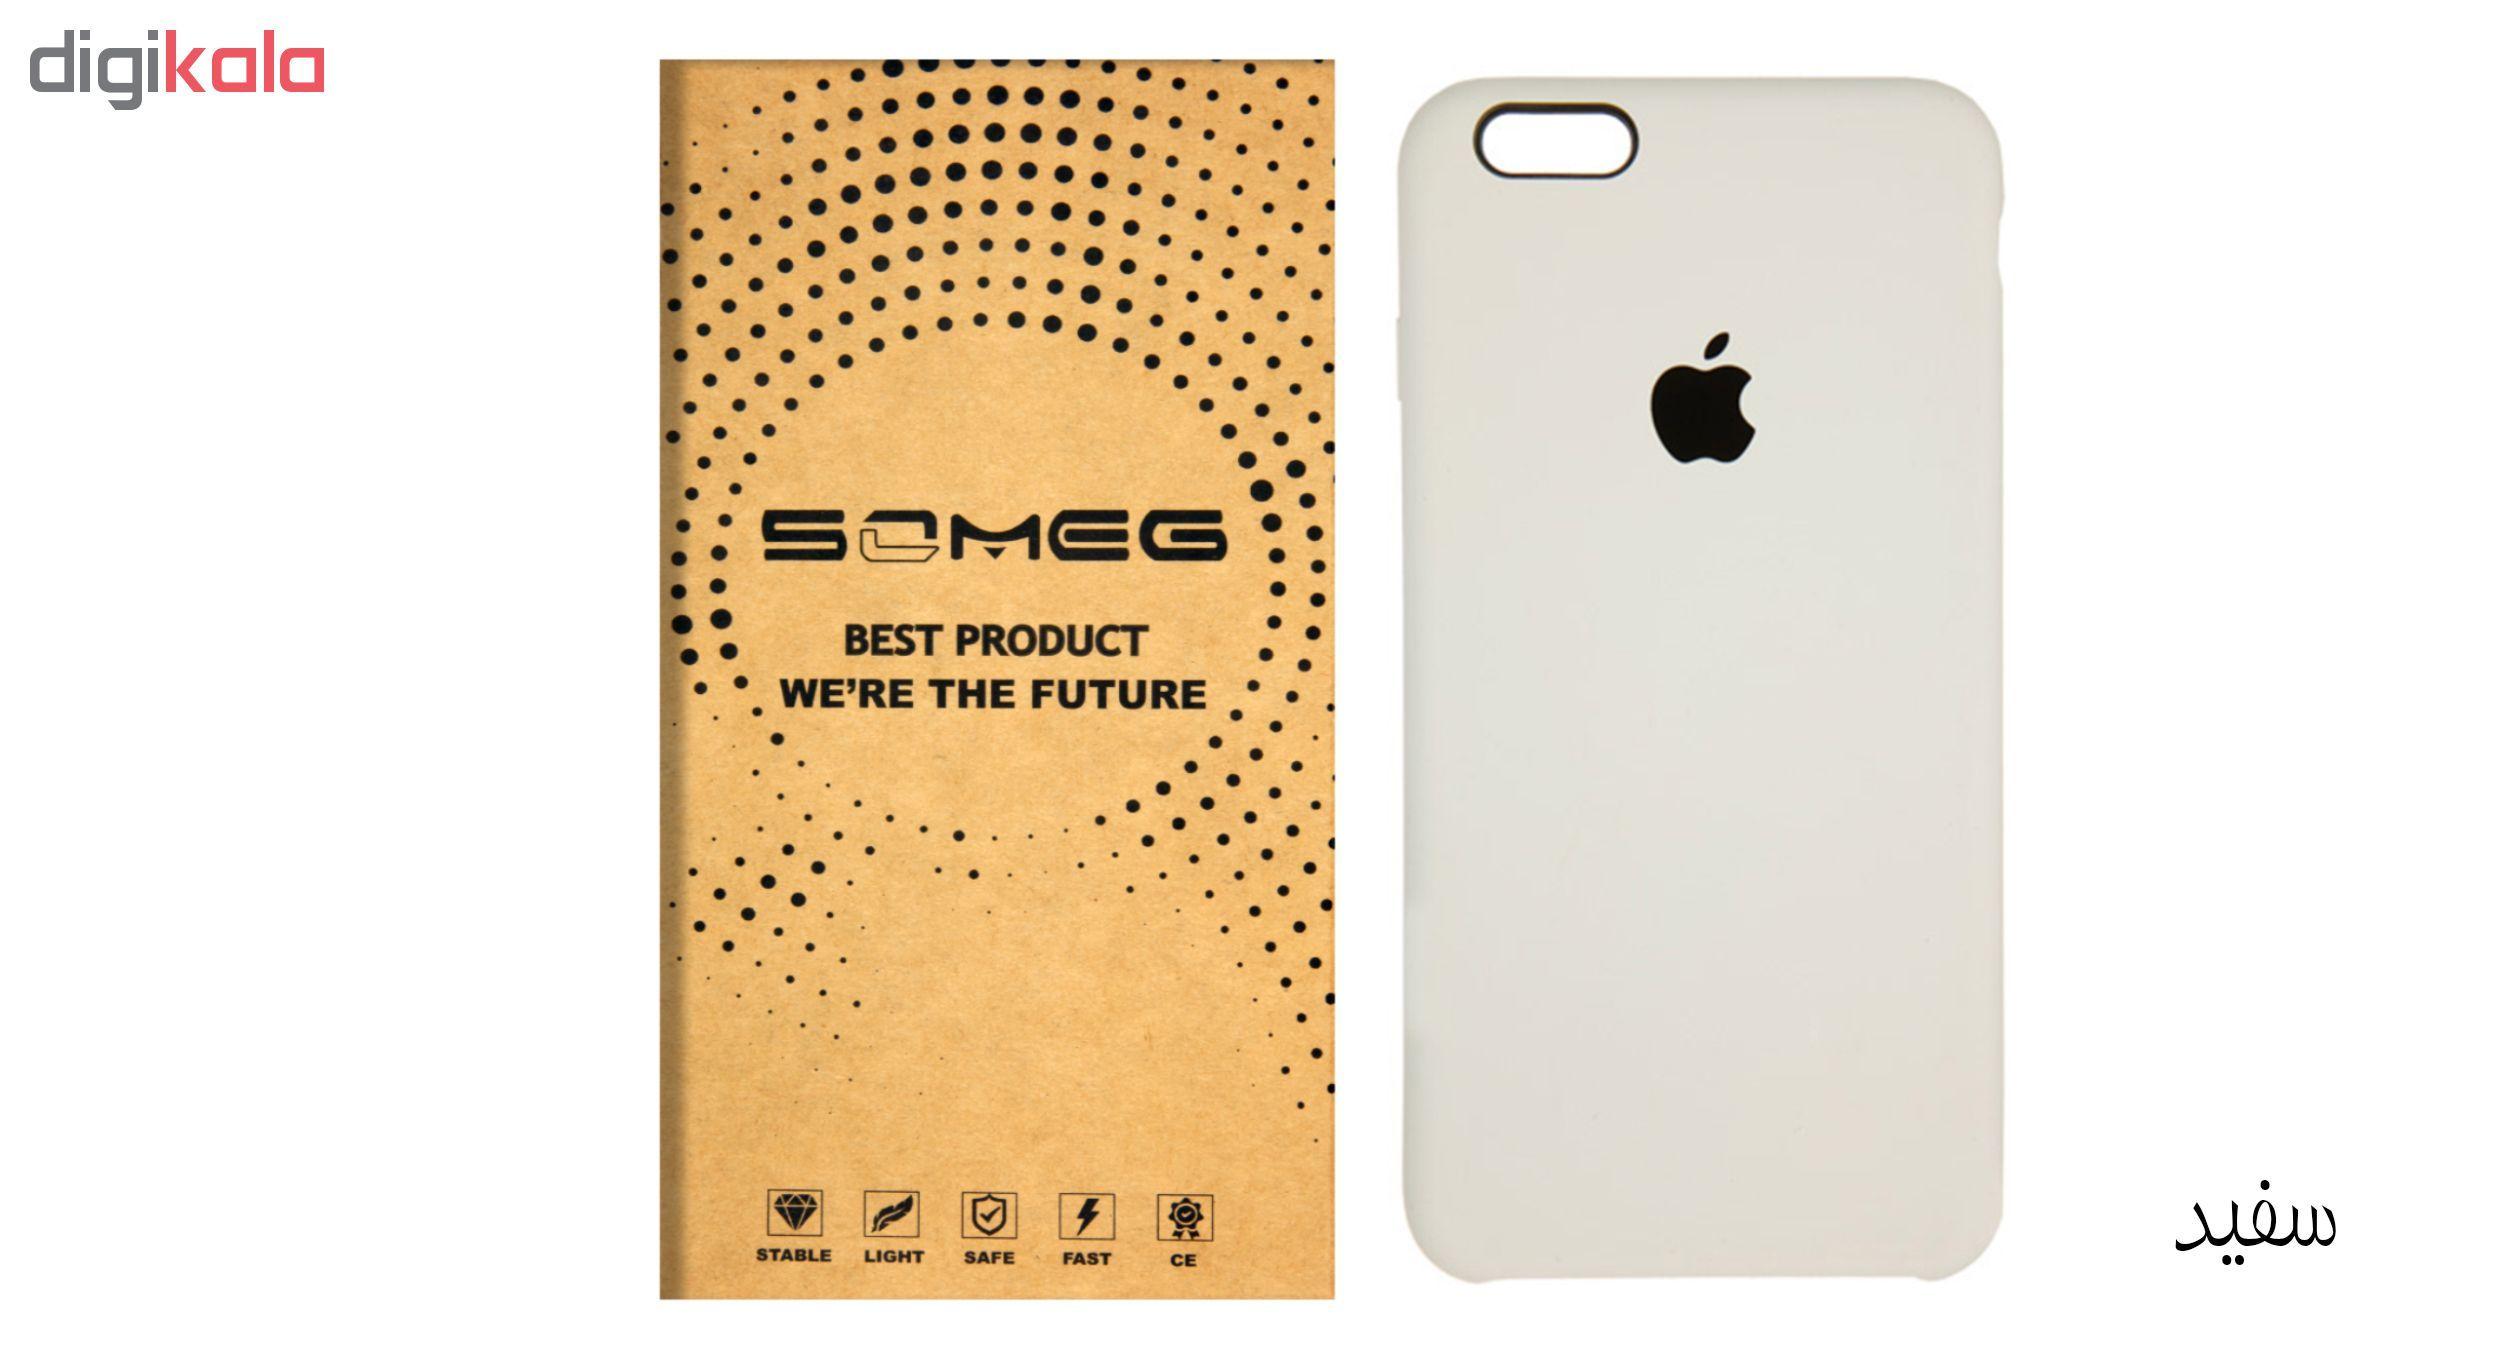 کاور سومگ مدل SIC مناسب برای گوشی موبایل اپل iPhone 6/6s main 1 34